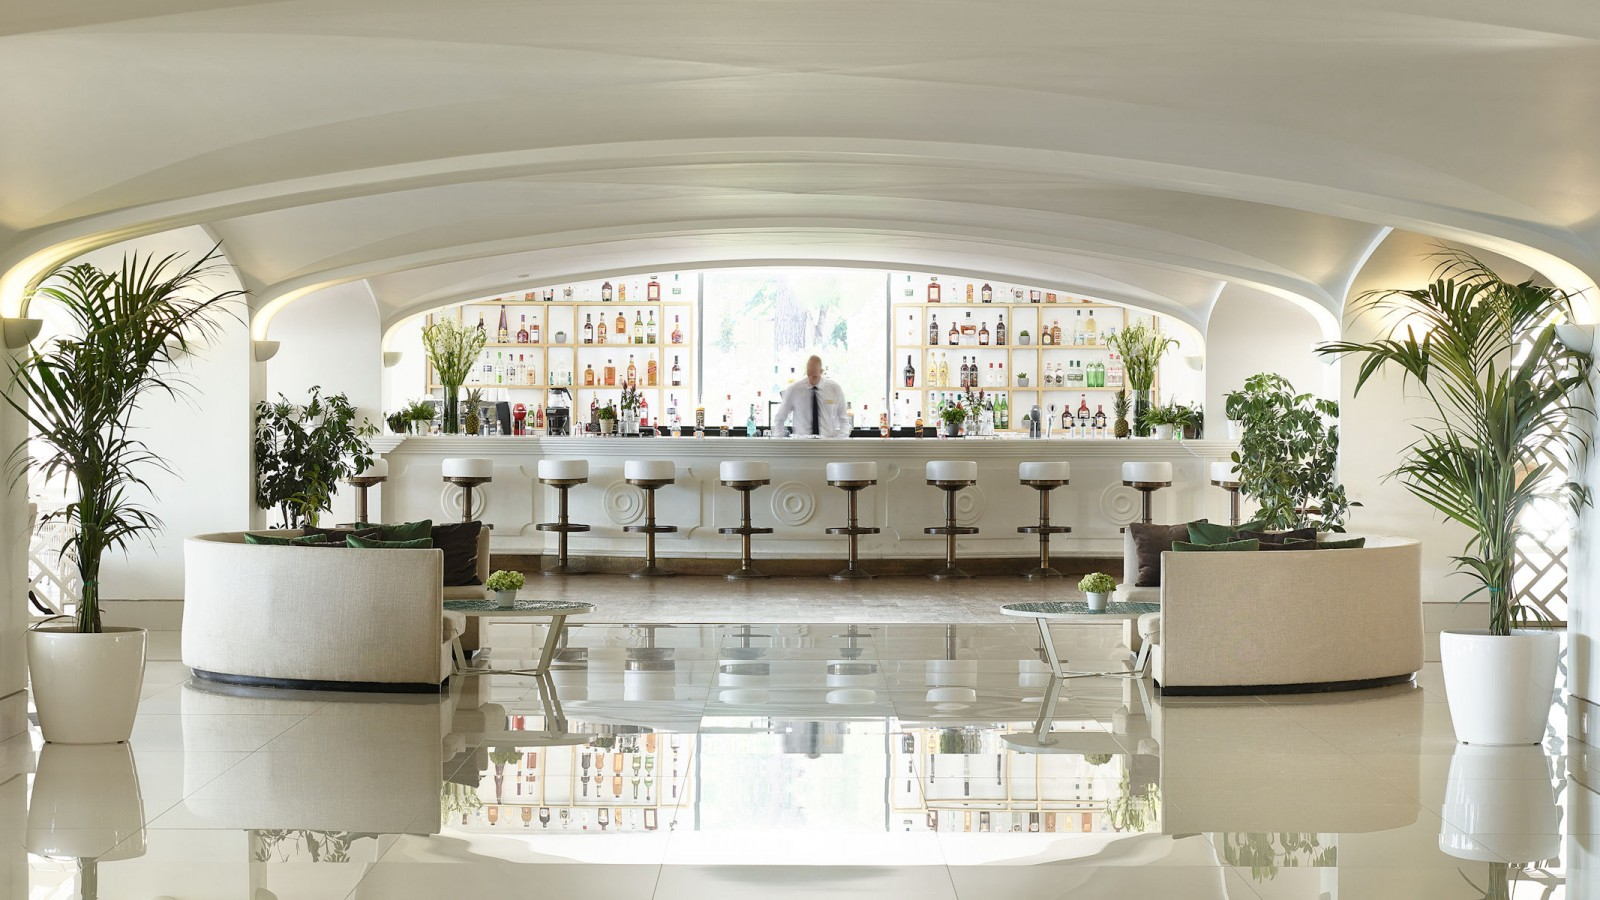 LUX ME Daphnila Bay Kiparrisi Terrasse Bar & Salon